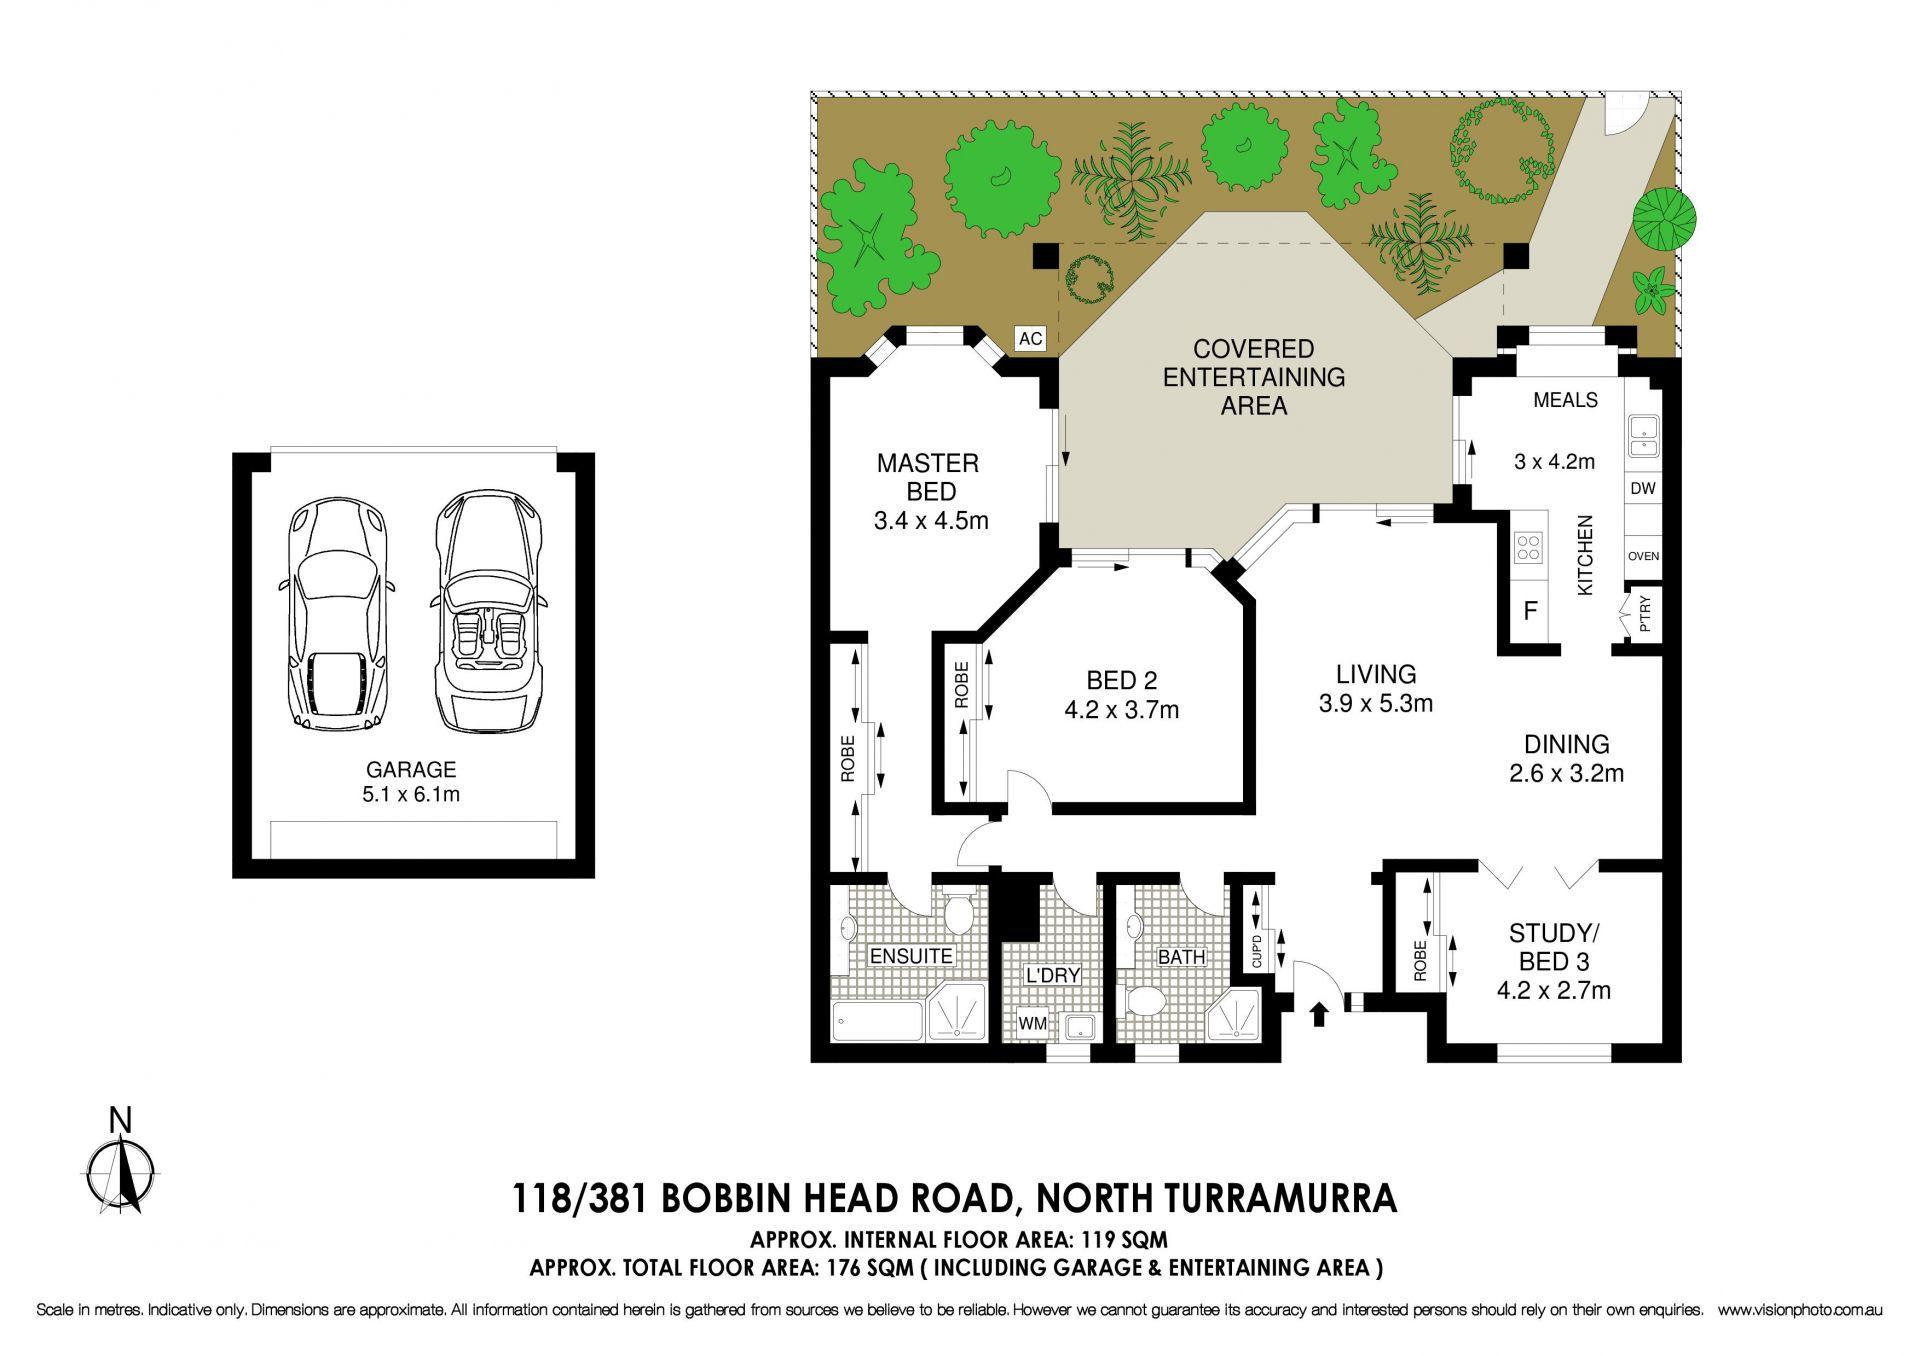 118/381 Bobbin Head Road North Turramurra 2074